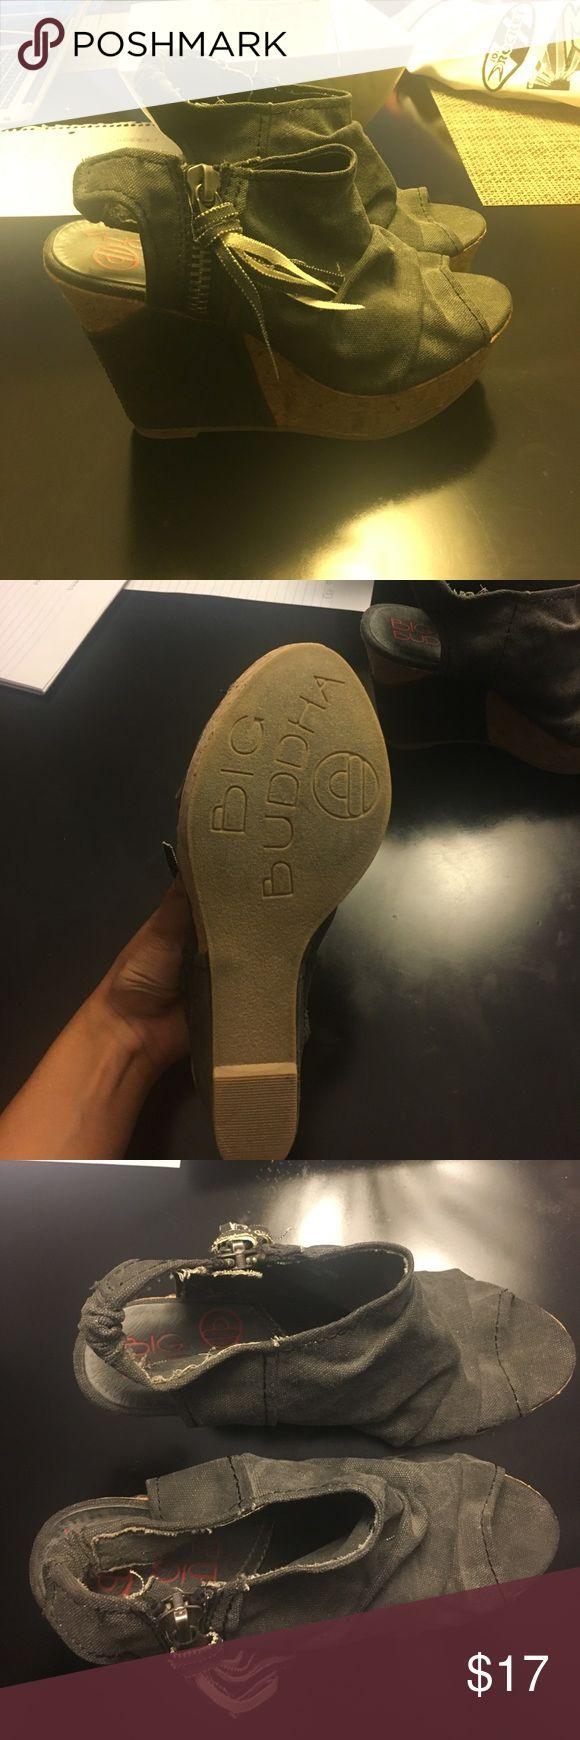 Wedges Wedges Big Buddha Shoes Wedges